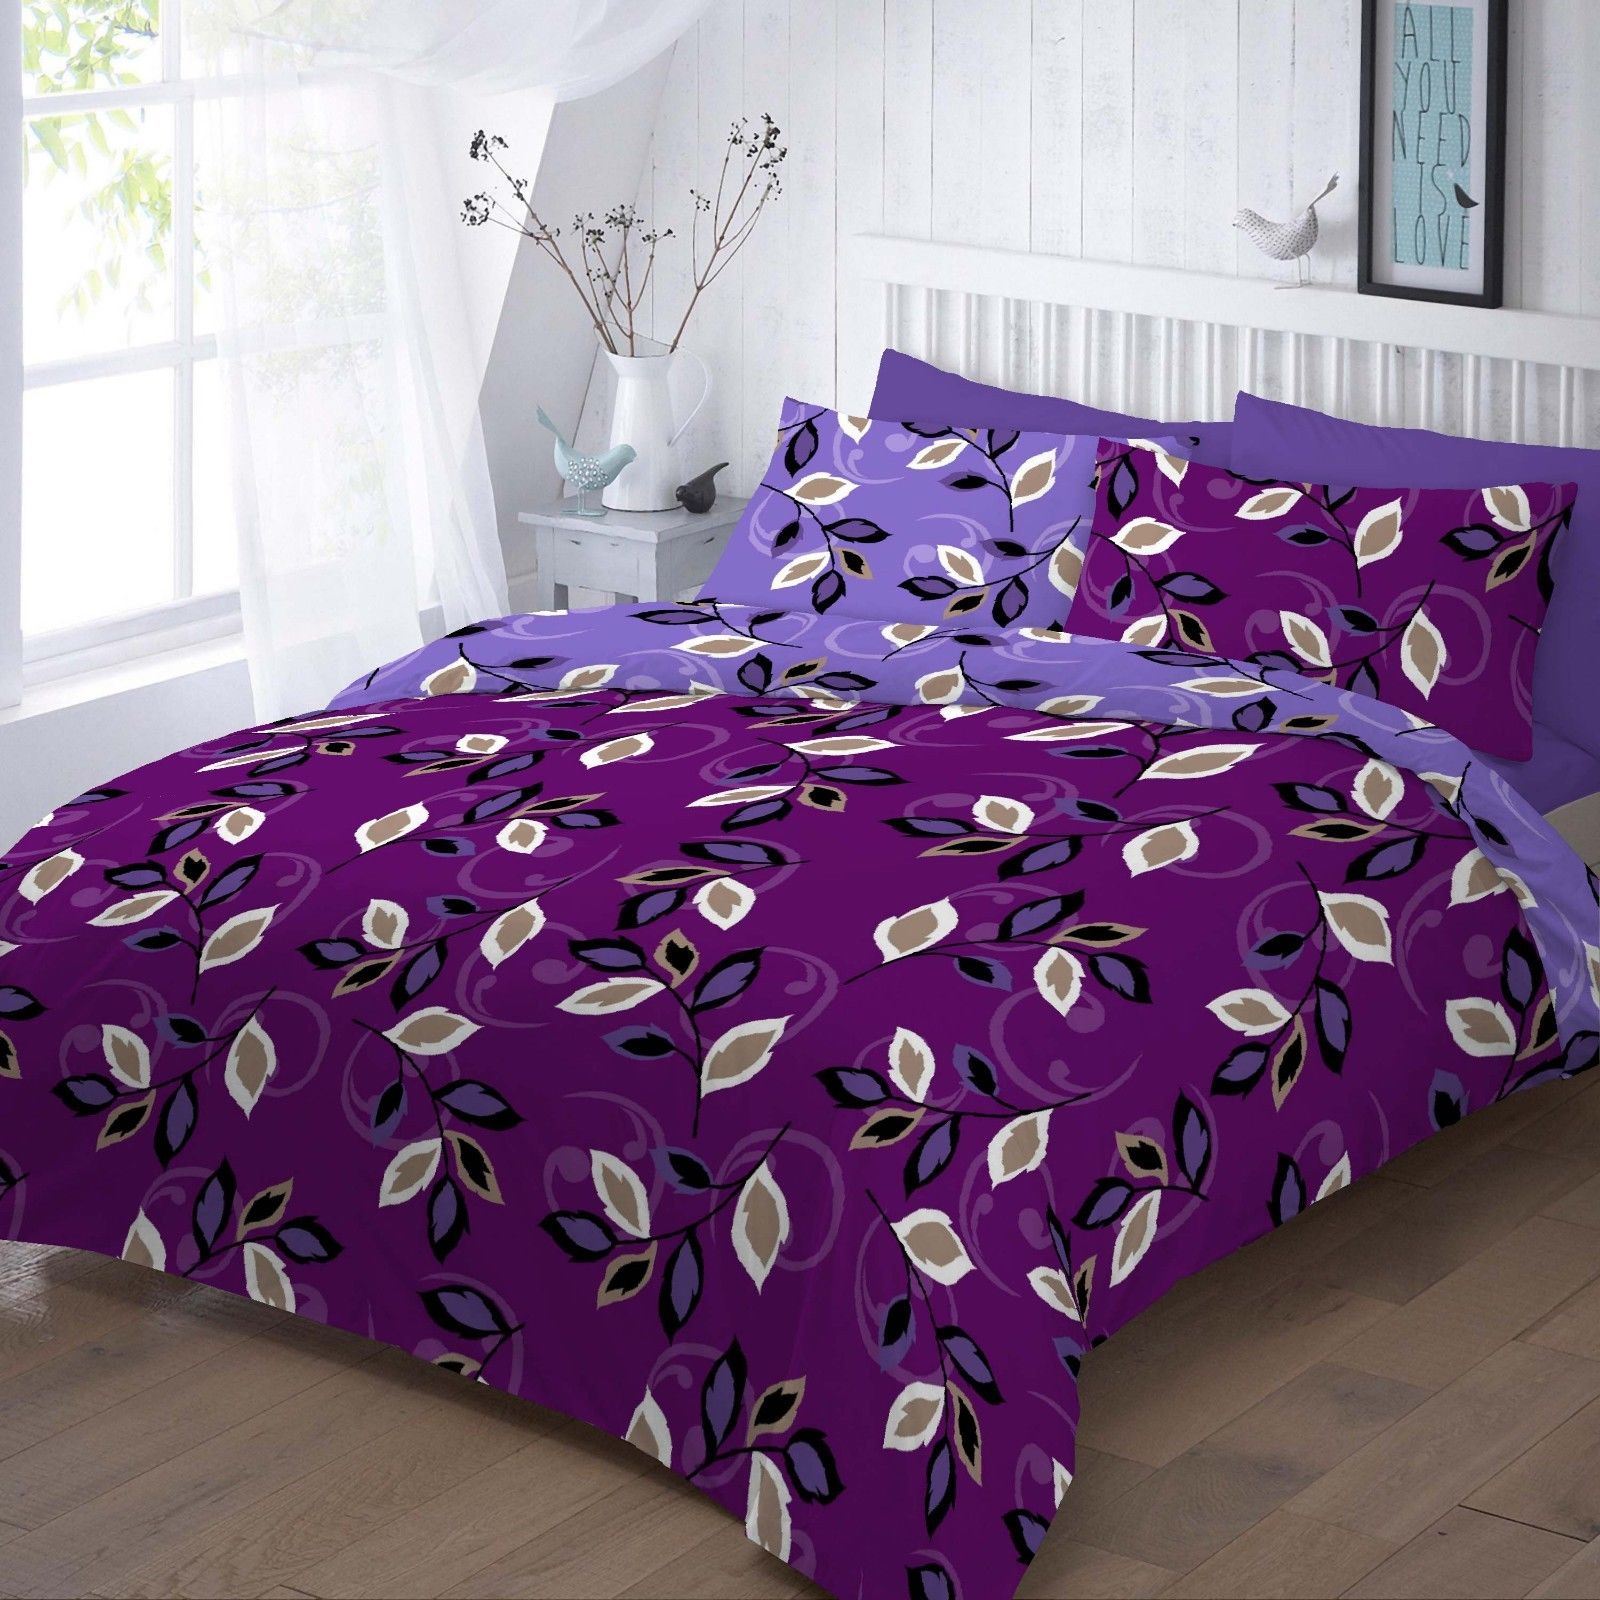 grace duvet cover set wholesale bedding store de lavish. Black Bedroom Furniture Sets. Home Design Ideas